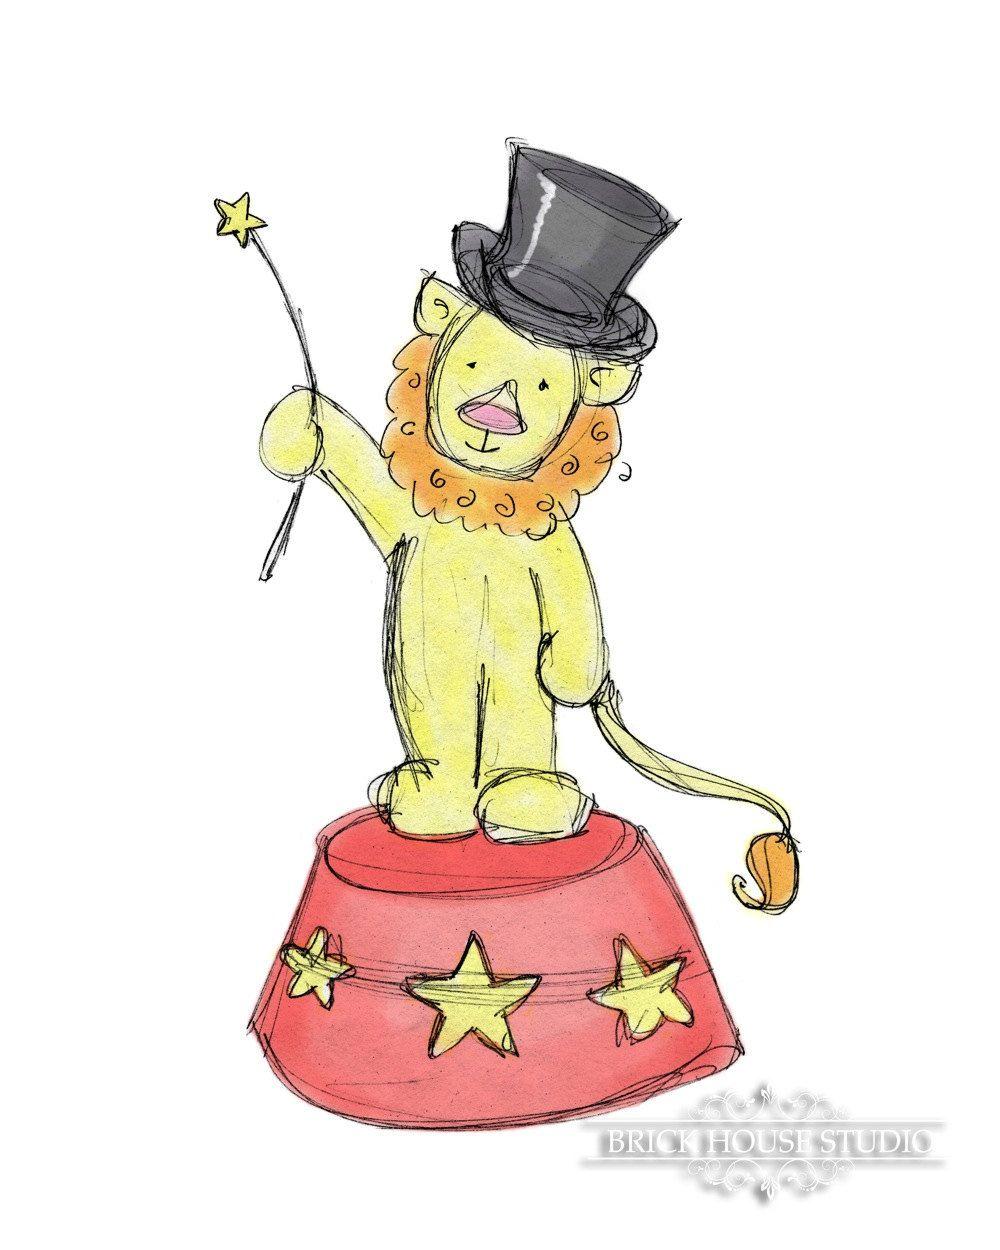 Nursery Room Art Circus Lion 5x7 Print by BrickHouseStudio, $9.00 ...